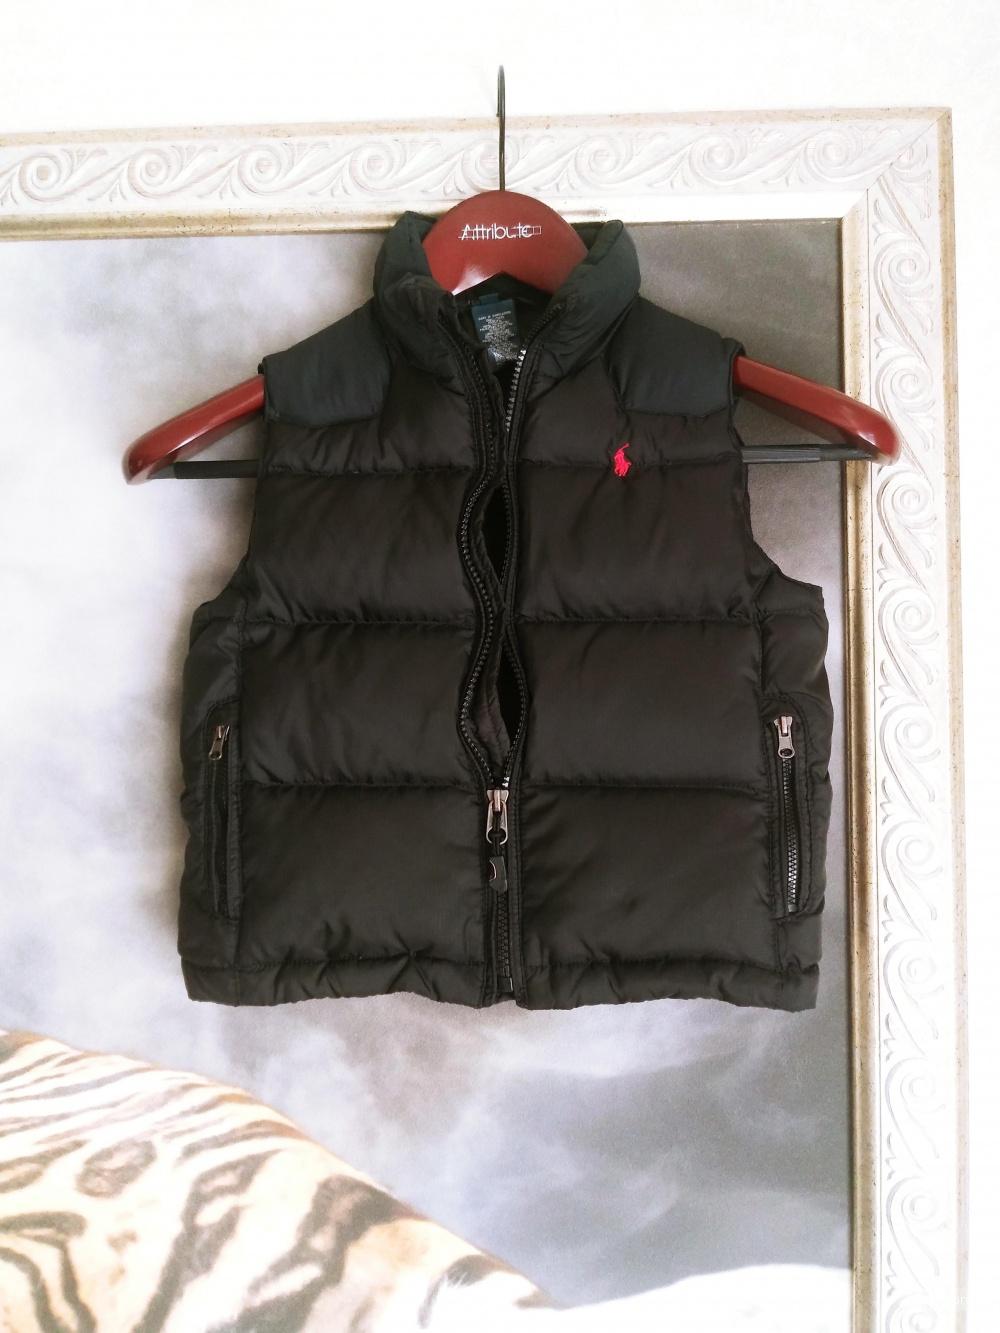 Жилет пуховый Polo Ralph Lauren, размер 3 Т.